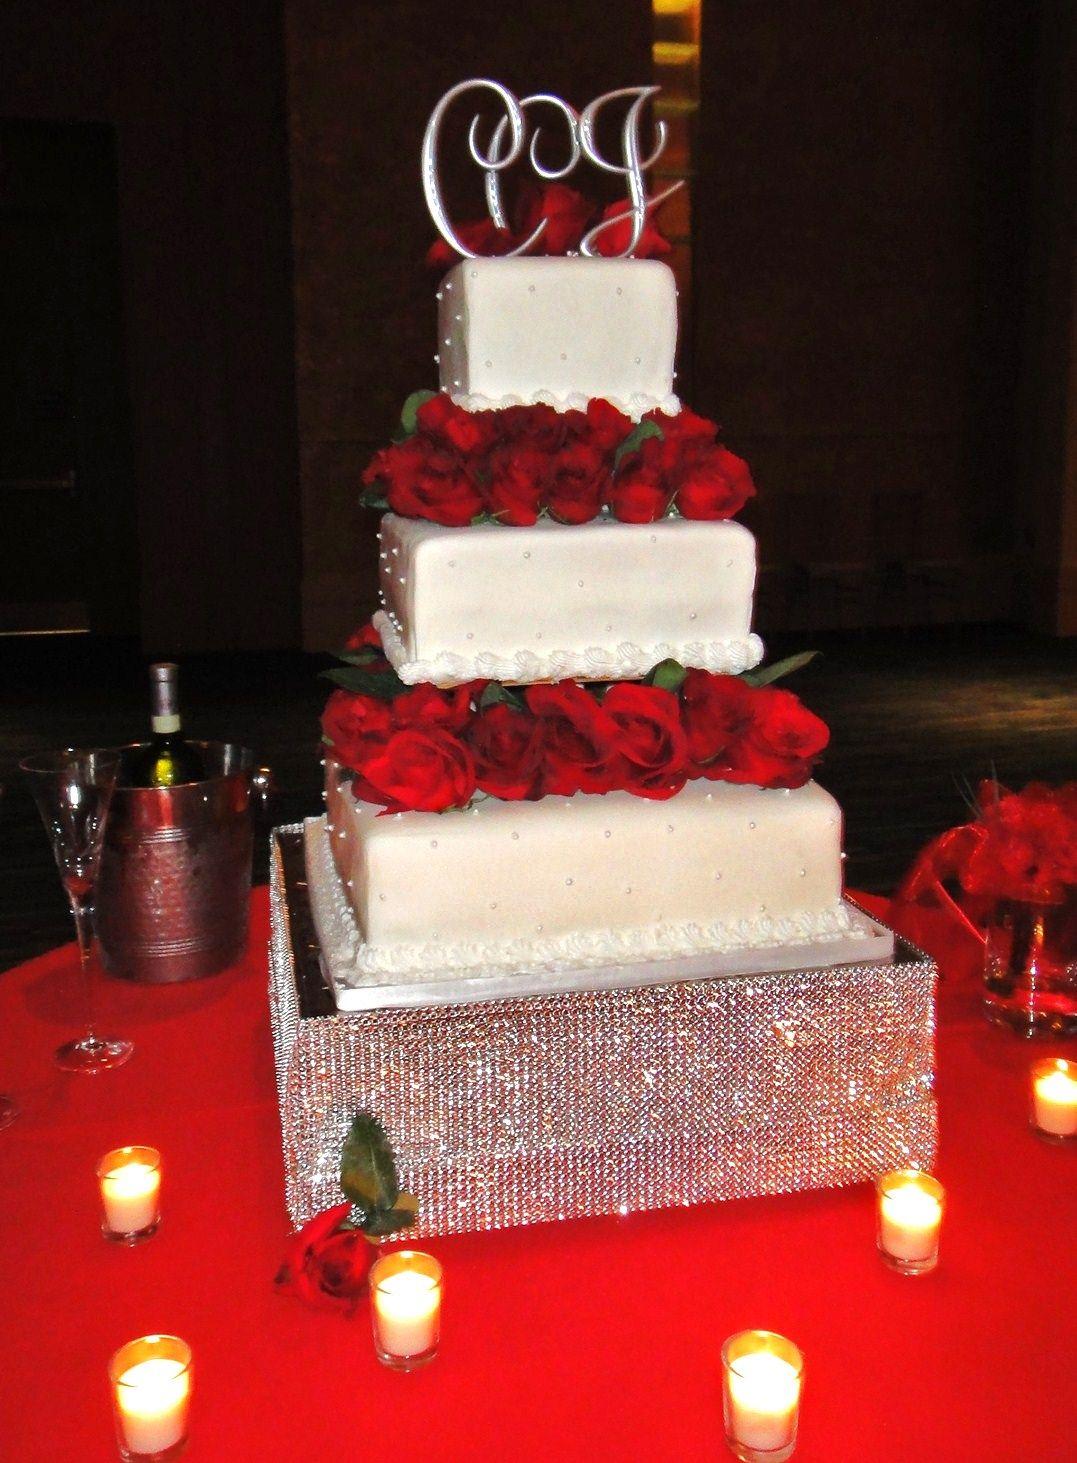 Pin Camo Bling Girl Cake Cakes I Have Made Cake on Pinterest